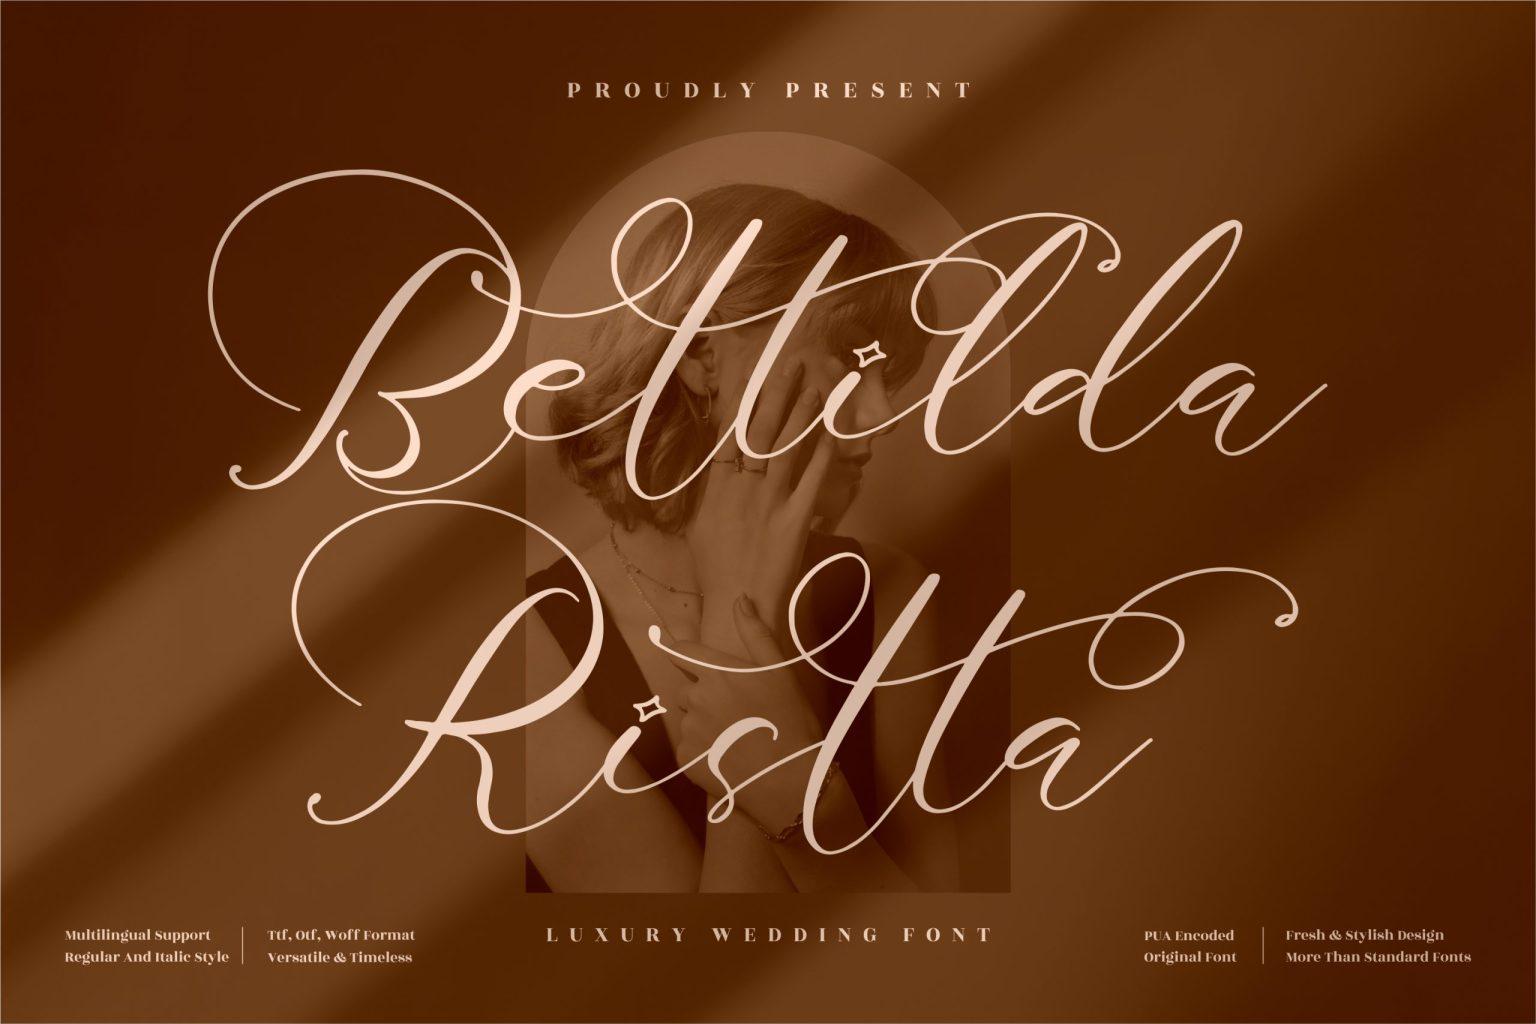 Bettilda Ristta Font